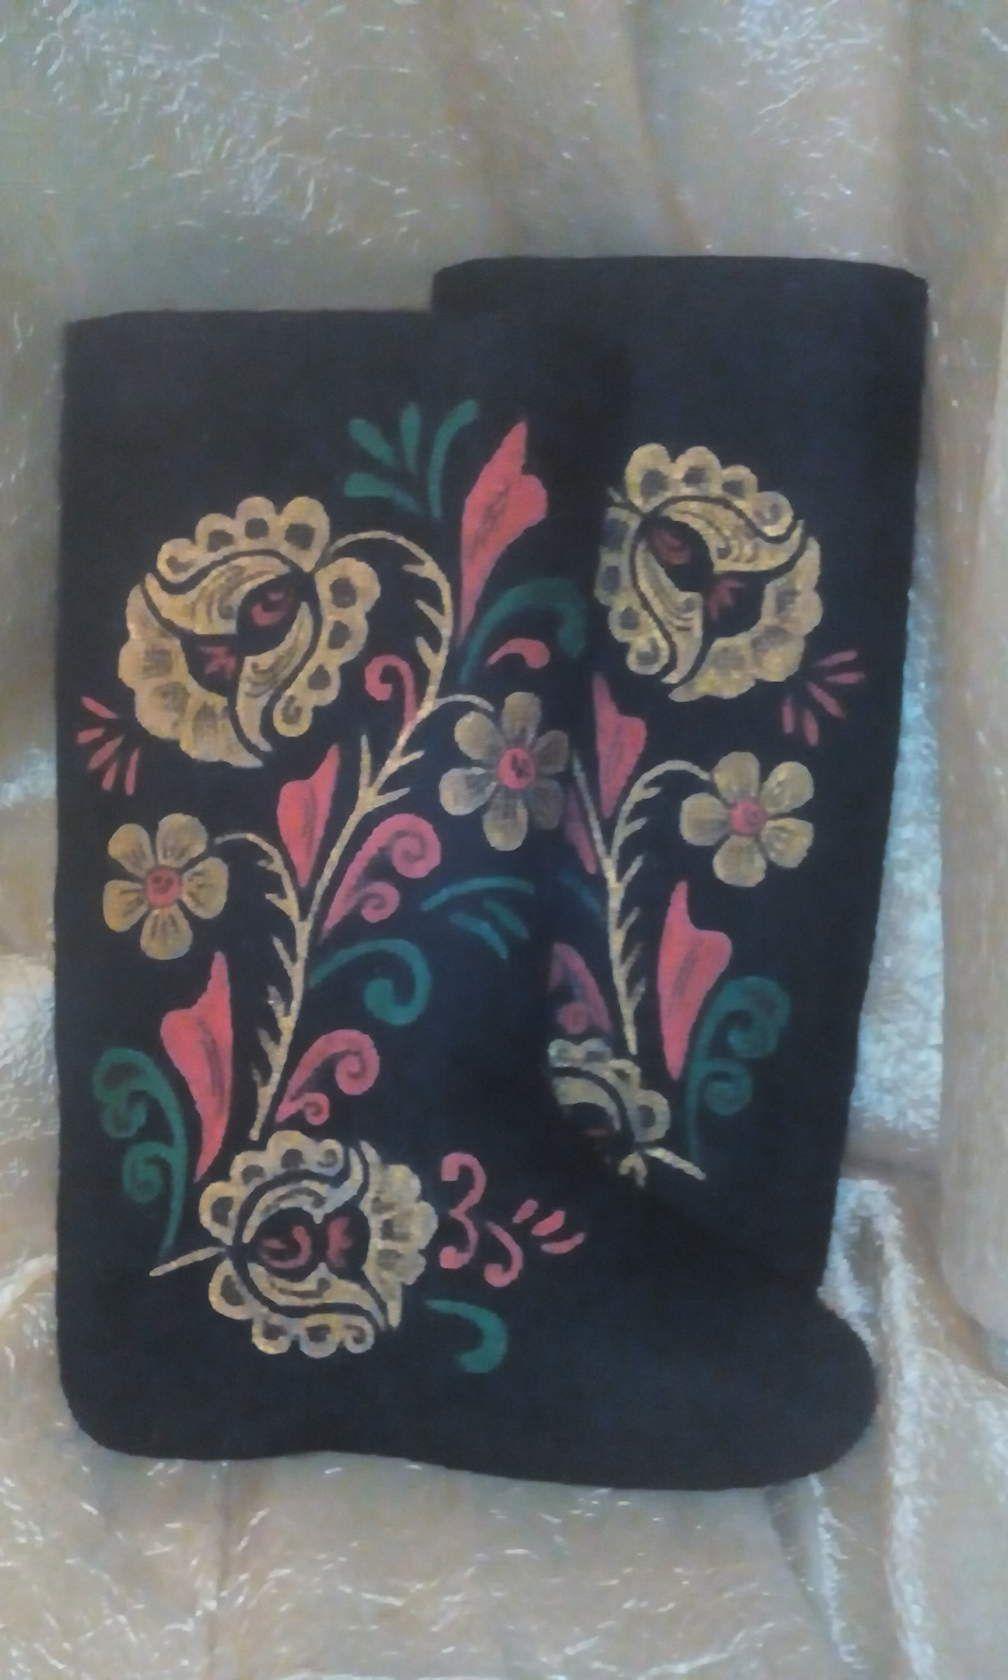 валенкитепло рисунок краски